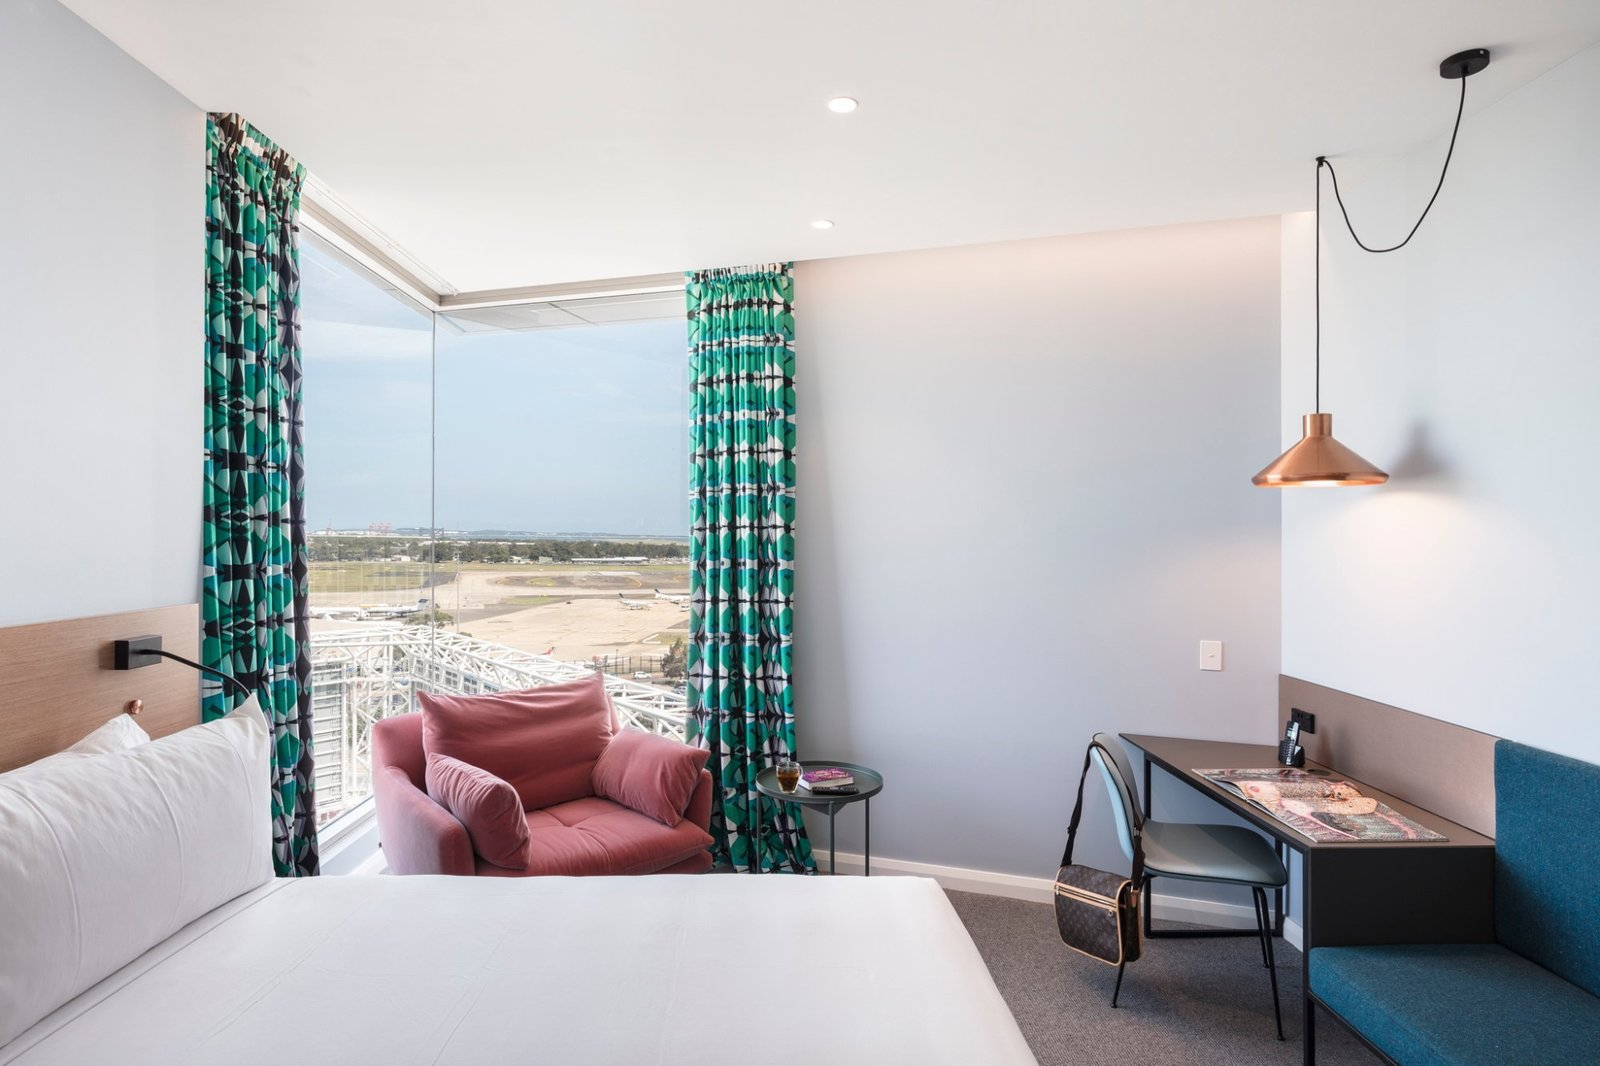 Bedroom, Recessed Lighting, Pendant Lighting, Chair, Carpet Floor, Wall Lighting, and Bed  Photos from Felix Hotel